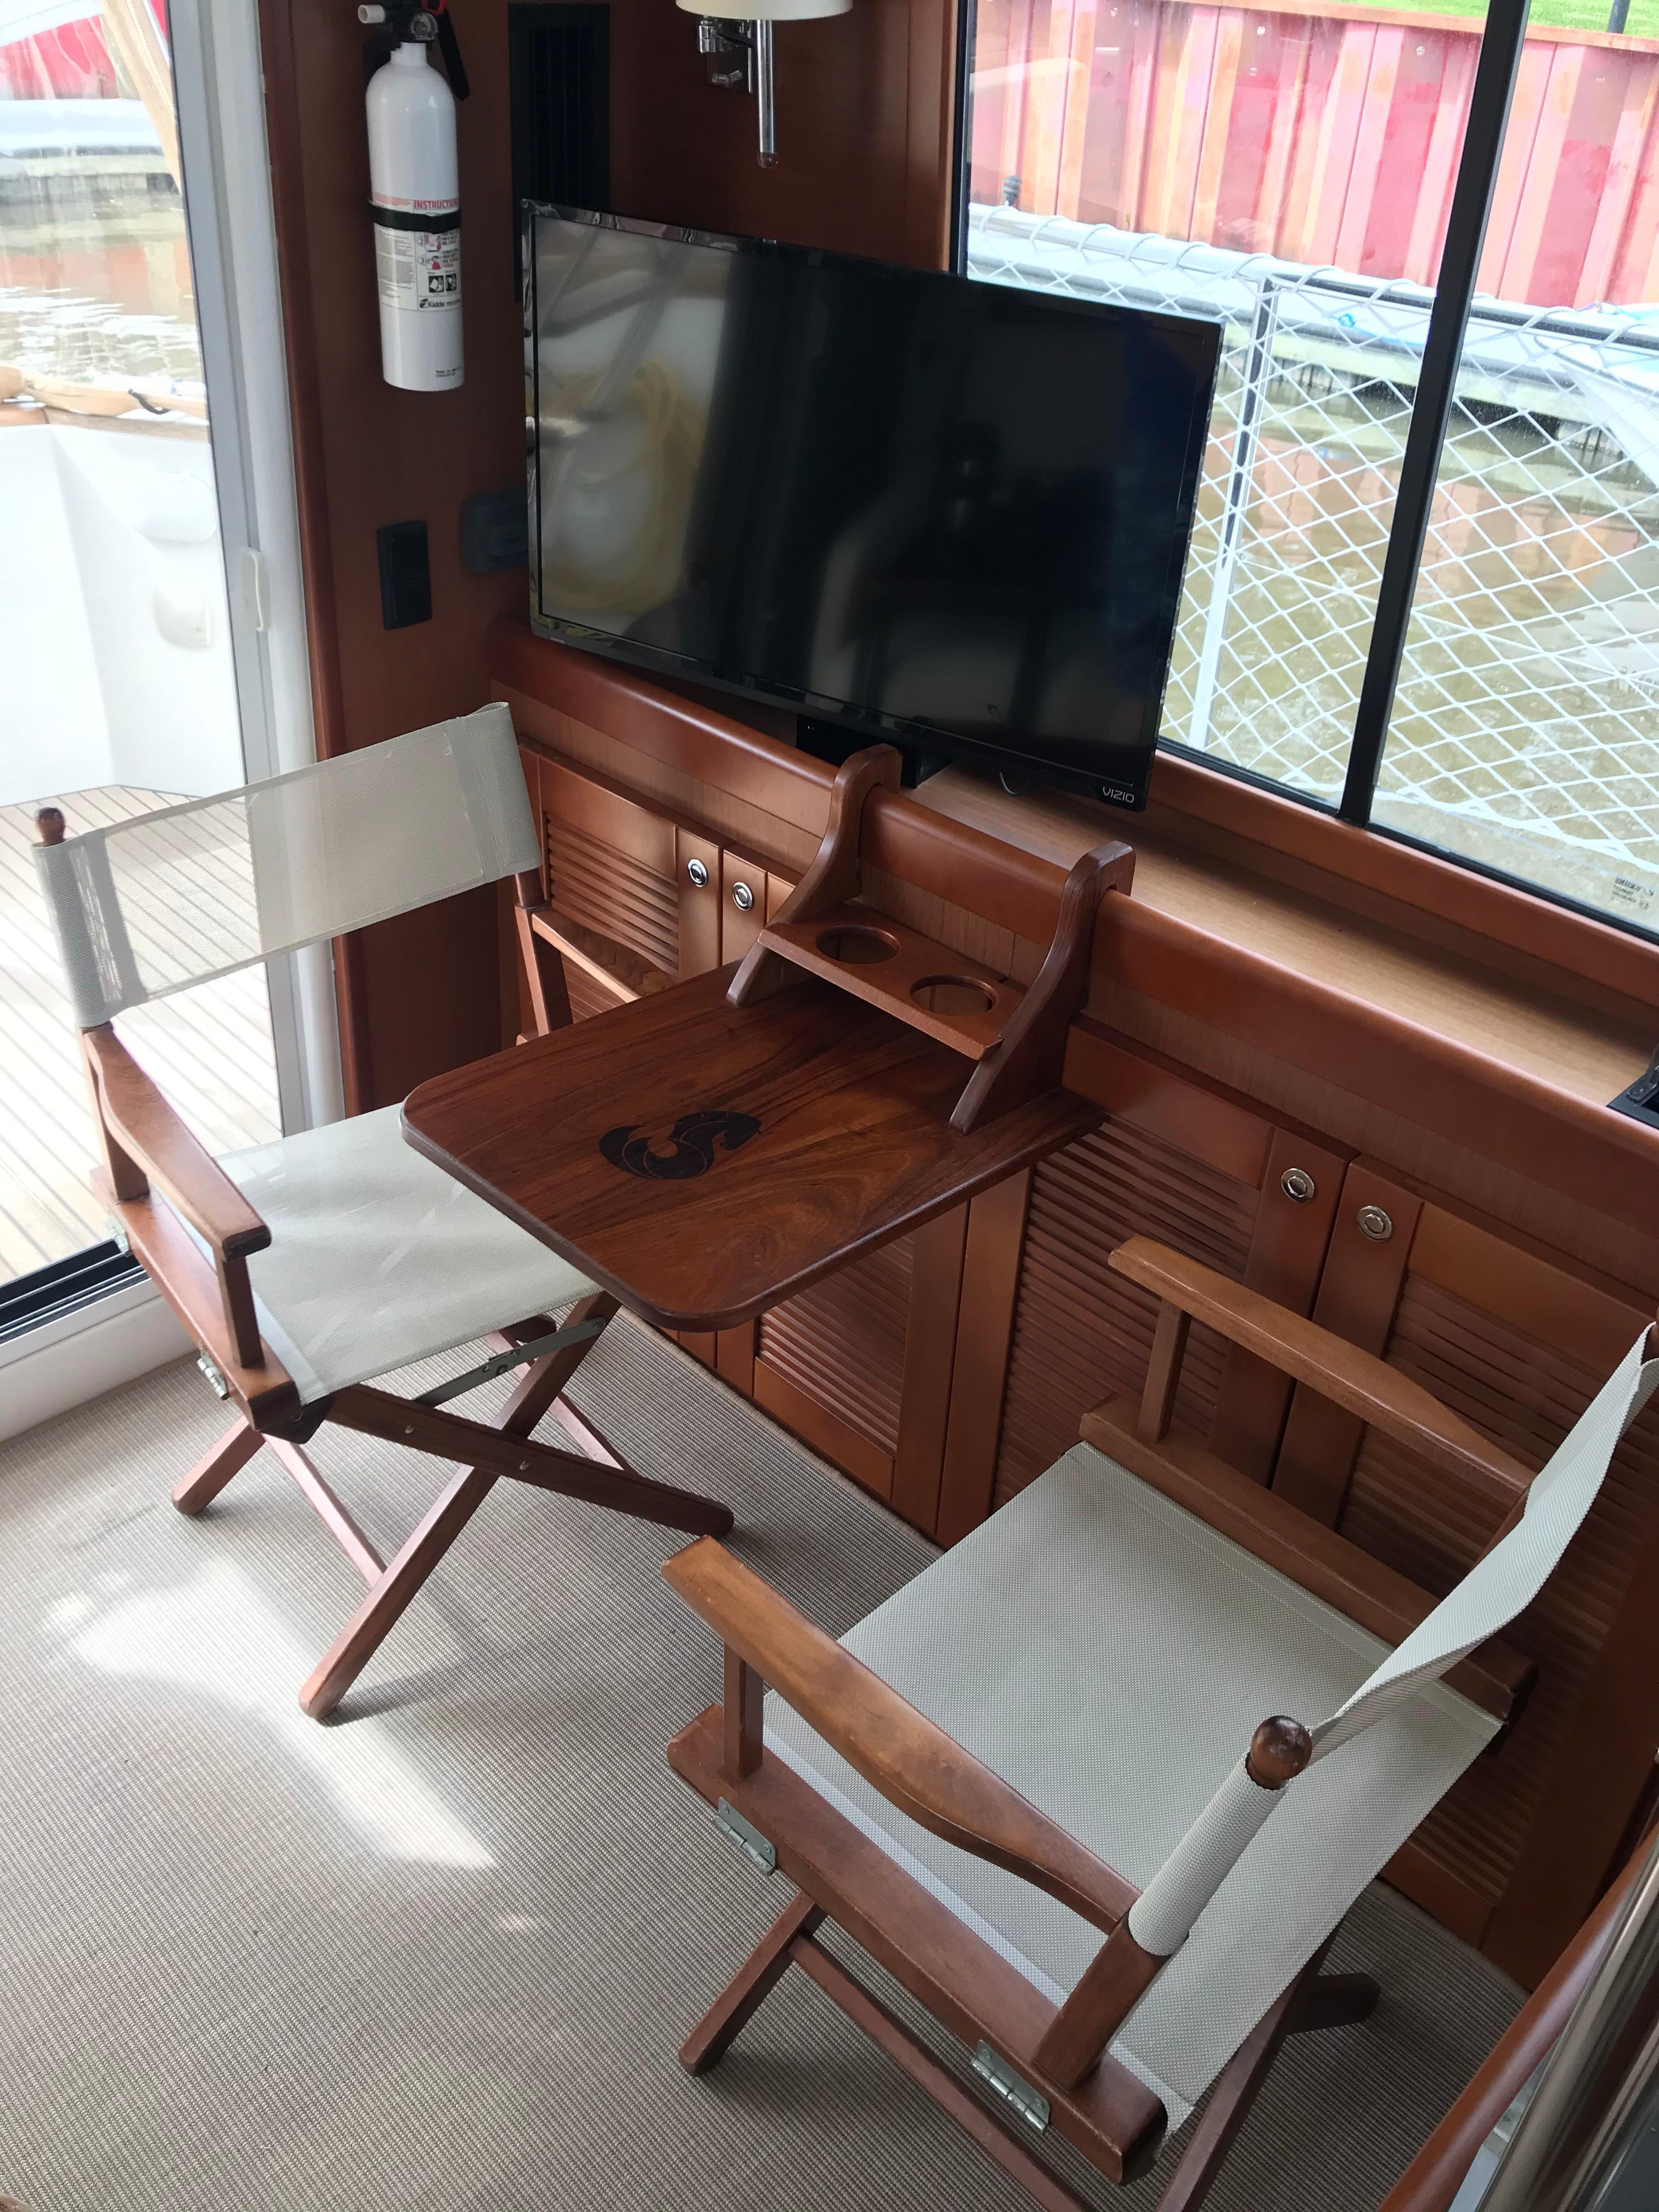 Beneteau 34 Swift Trawler - Salon Seating/Custom Table/Flatscreen TV